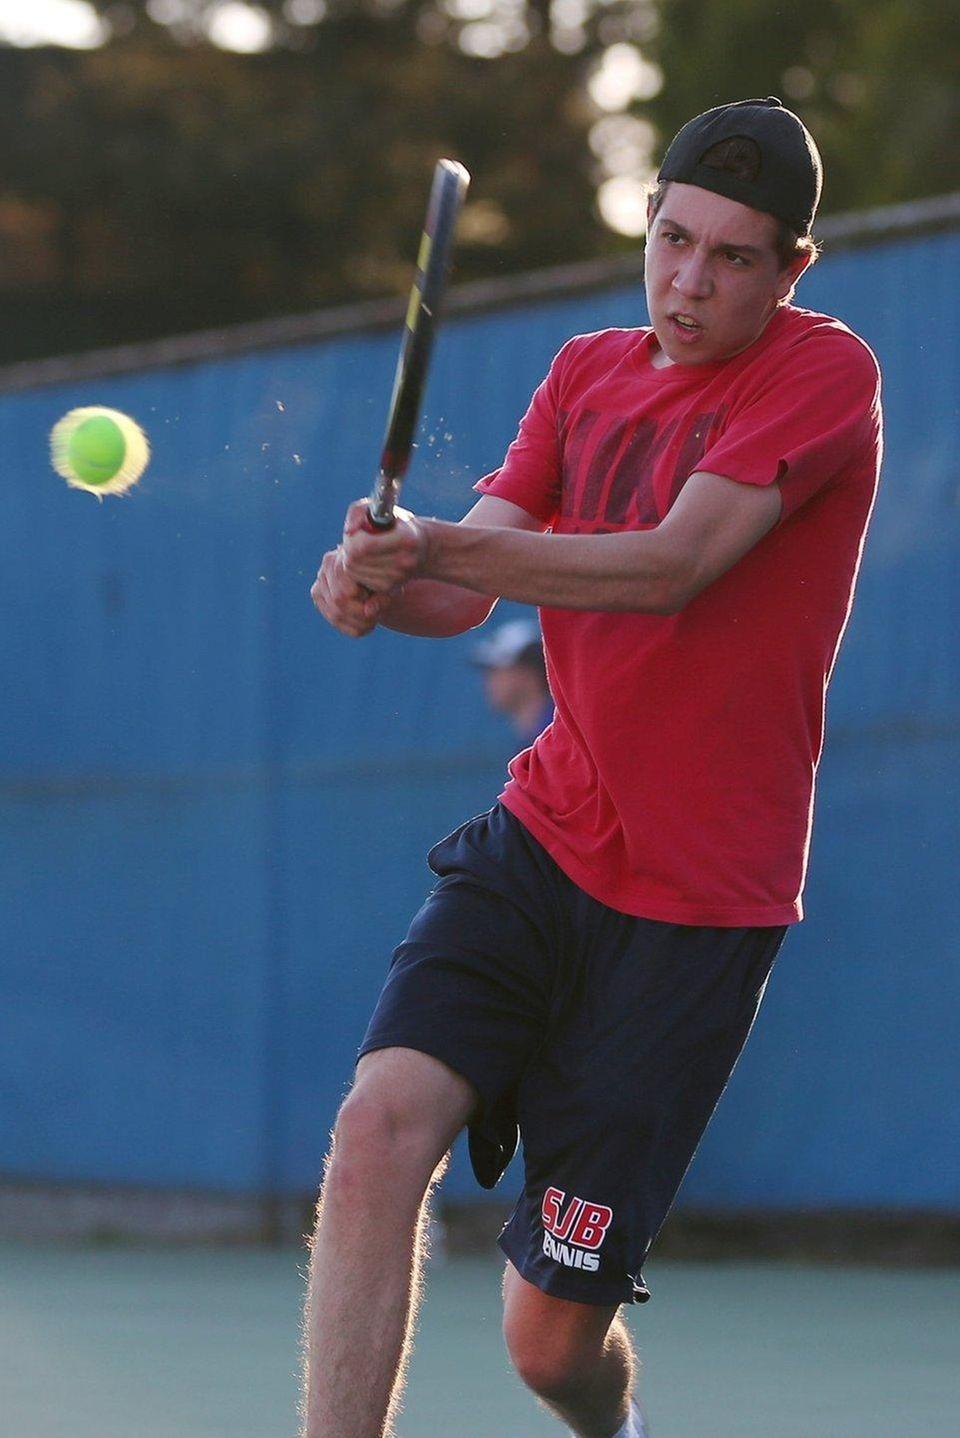 Bezos won the CHSAA singles championship in his